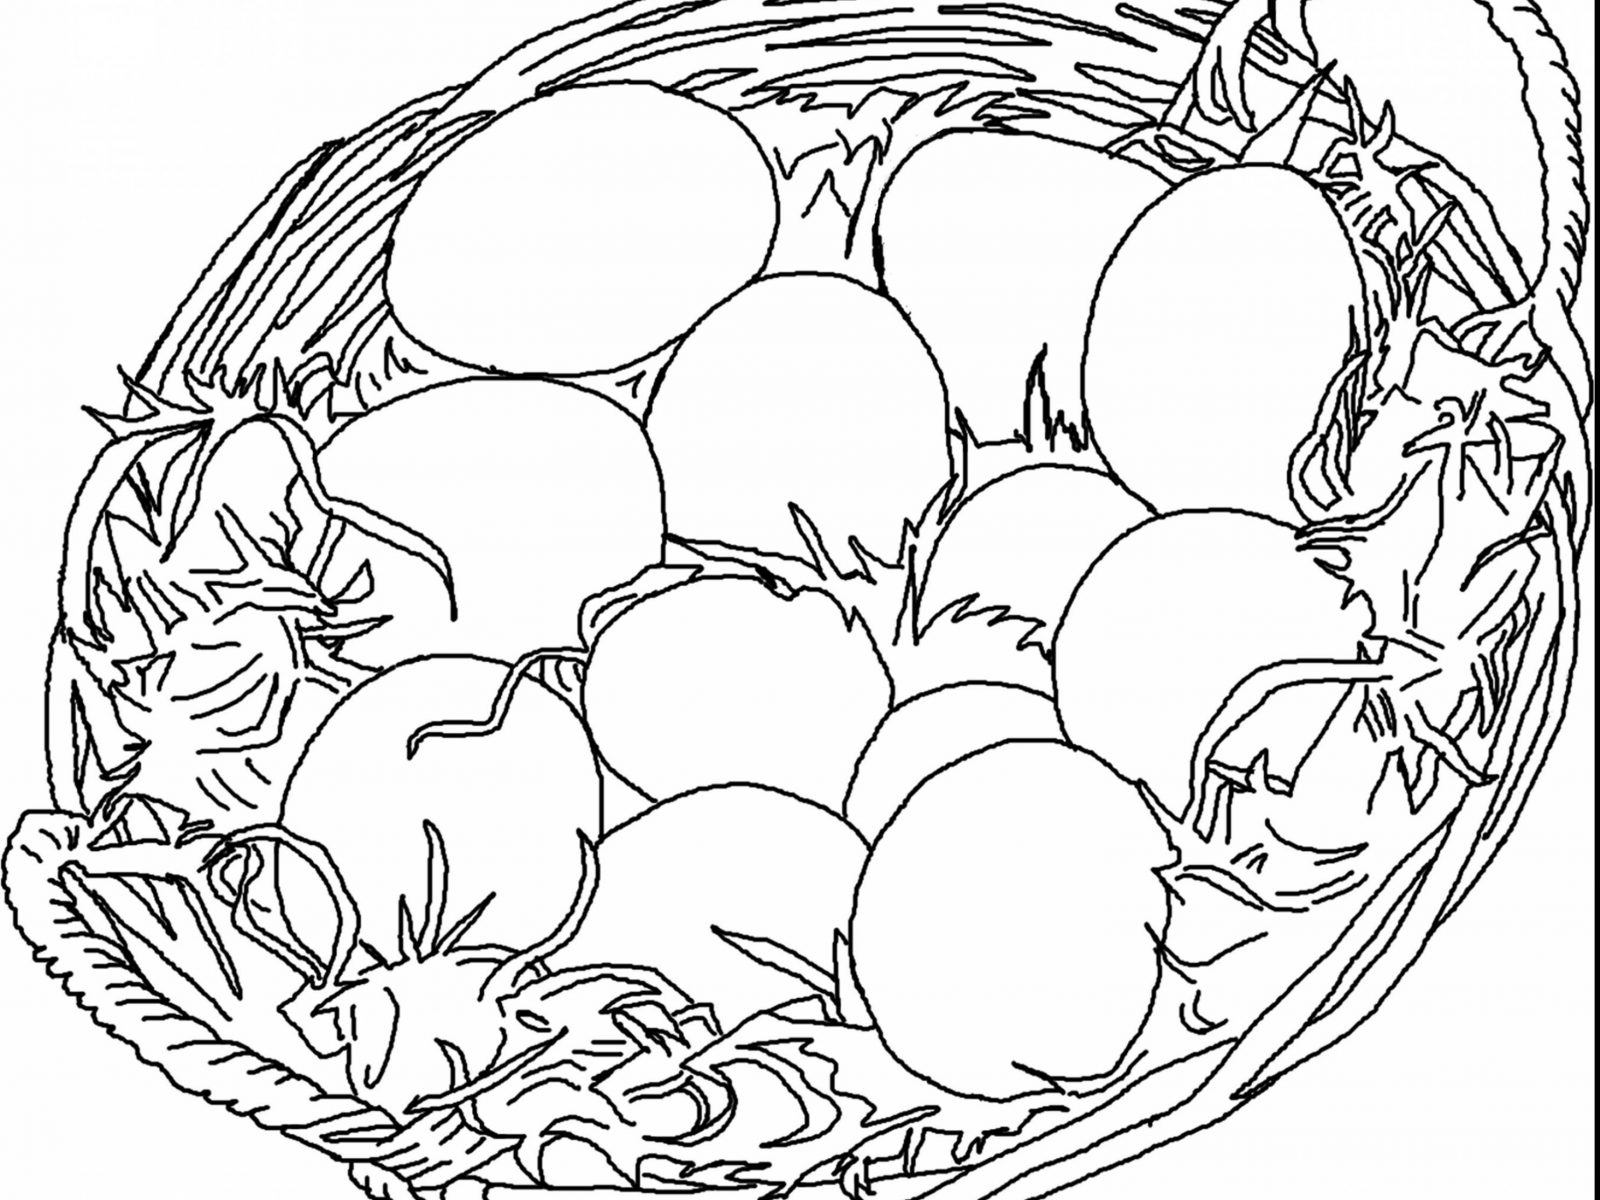 1600x1200 Easter Basket Colorings For Kids Sensational Bunny Egg Colouring